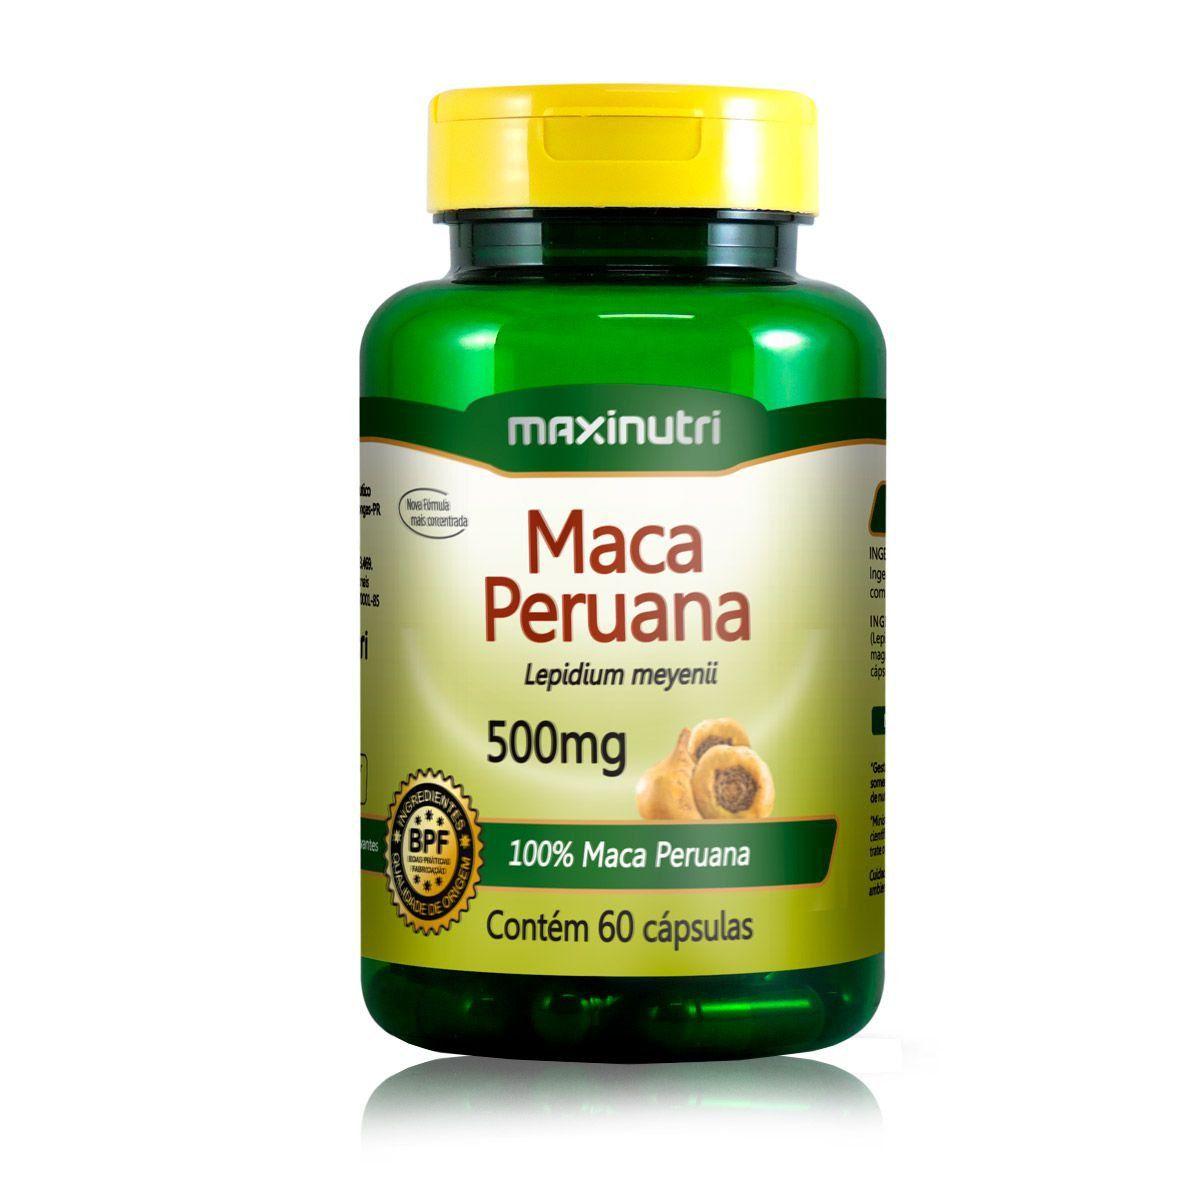 Maca Peruana 500mg 60 Caps - Maxinutri